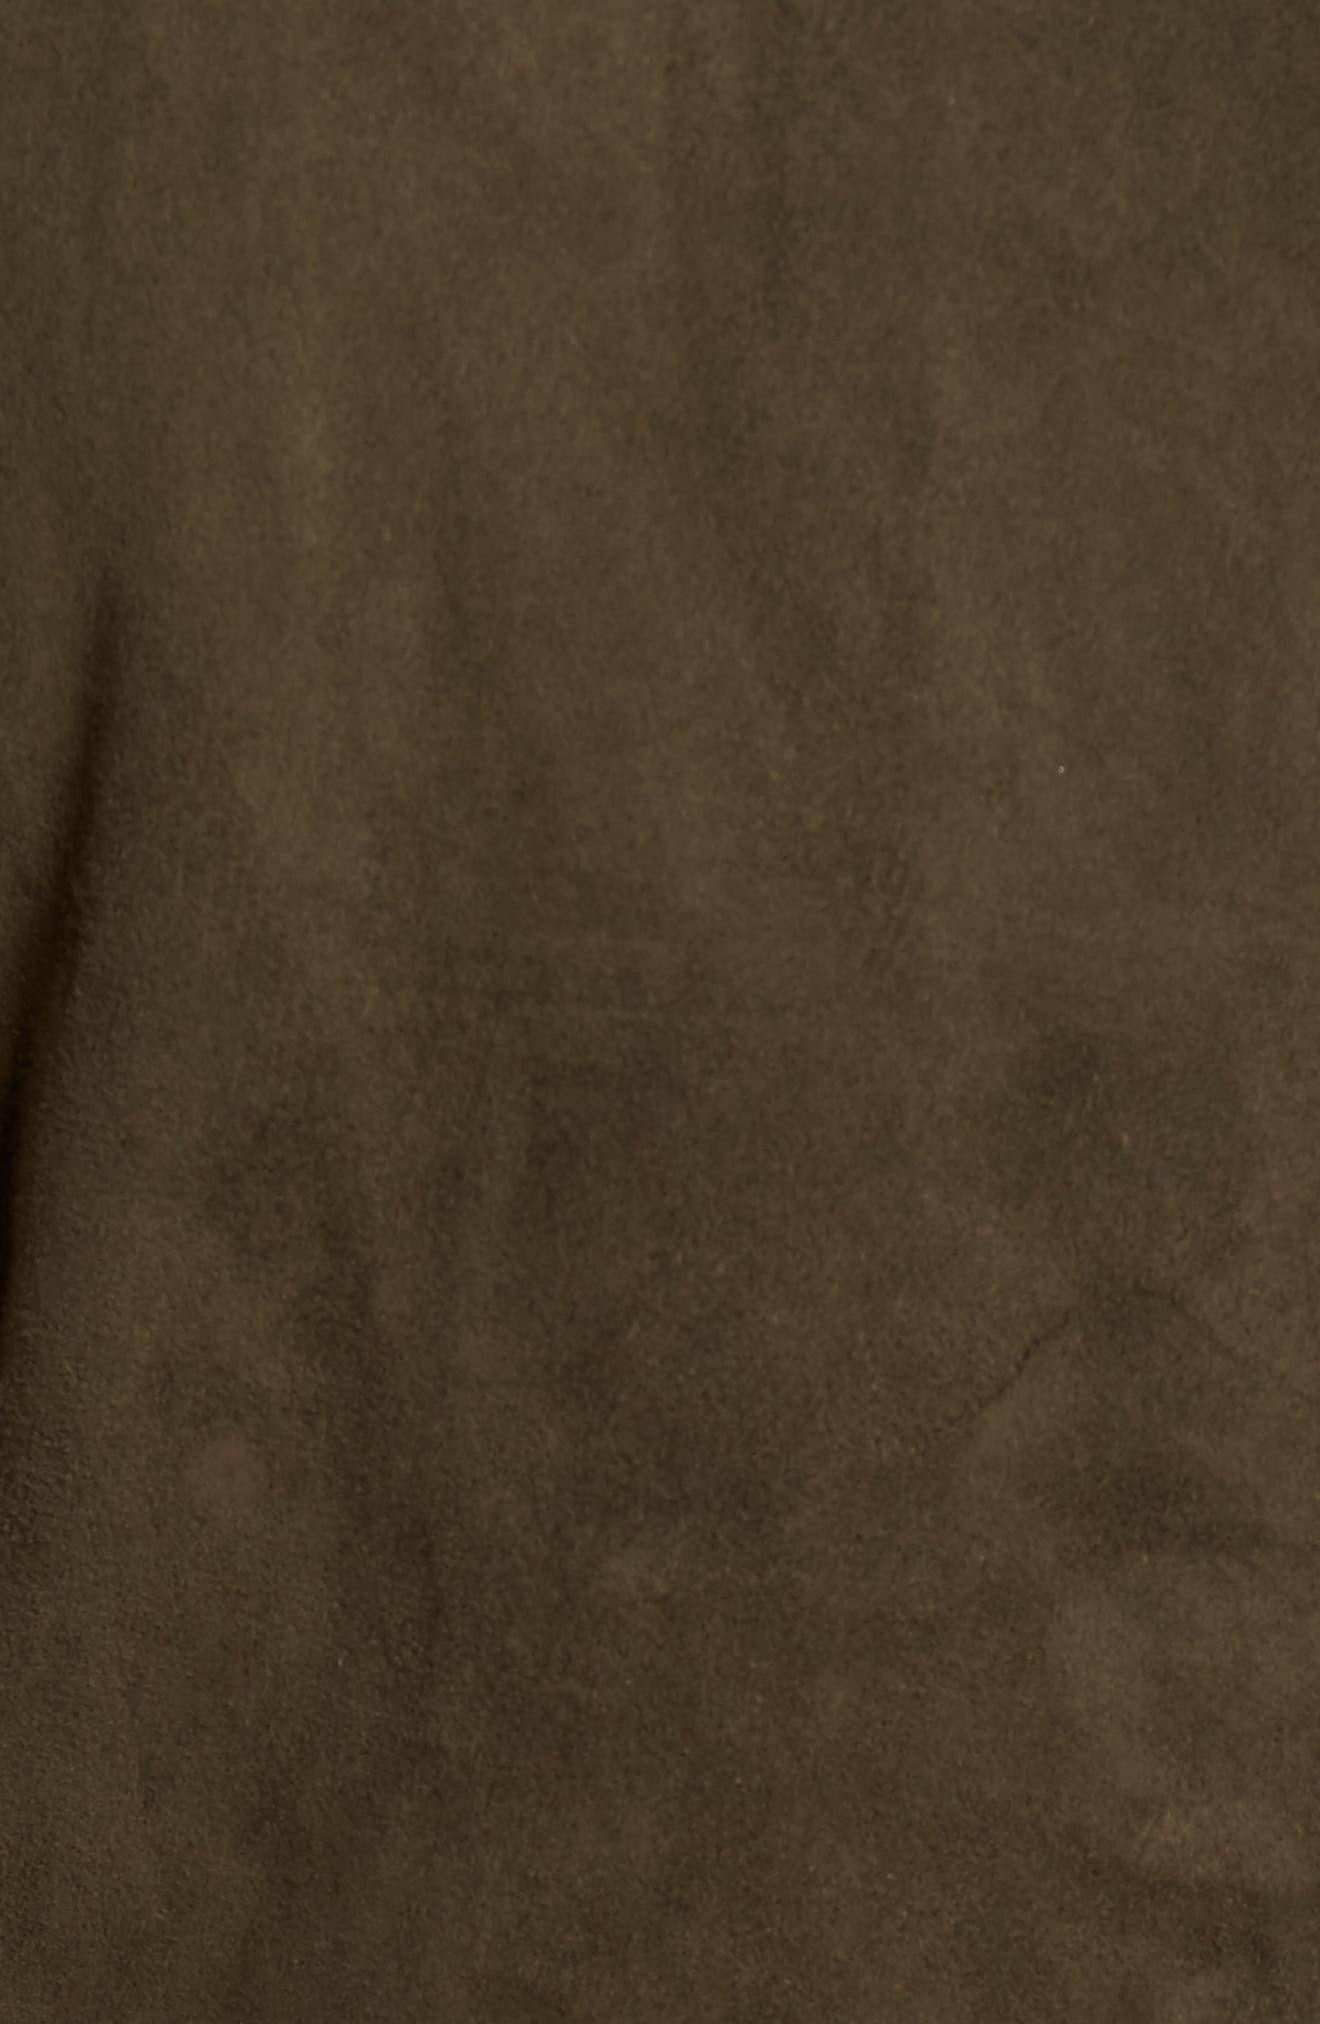 Zip Front Leather Jacket,                             Alternate thumbnail 6, color,                             307